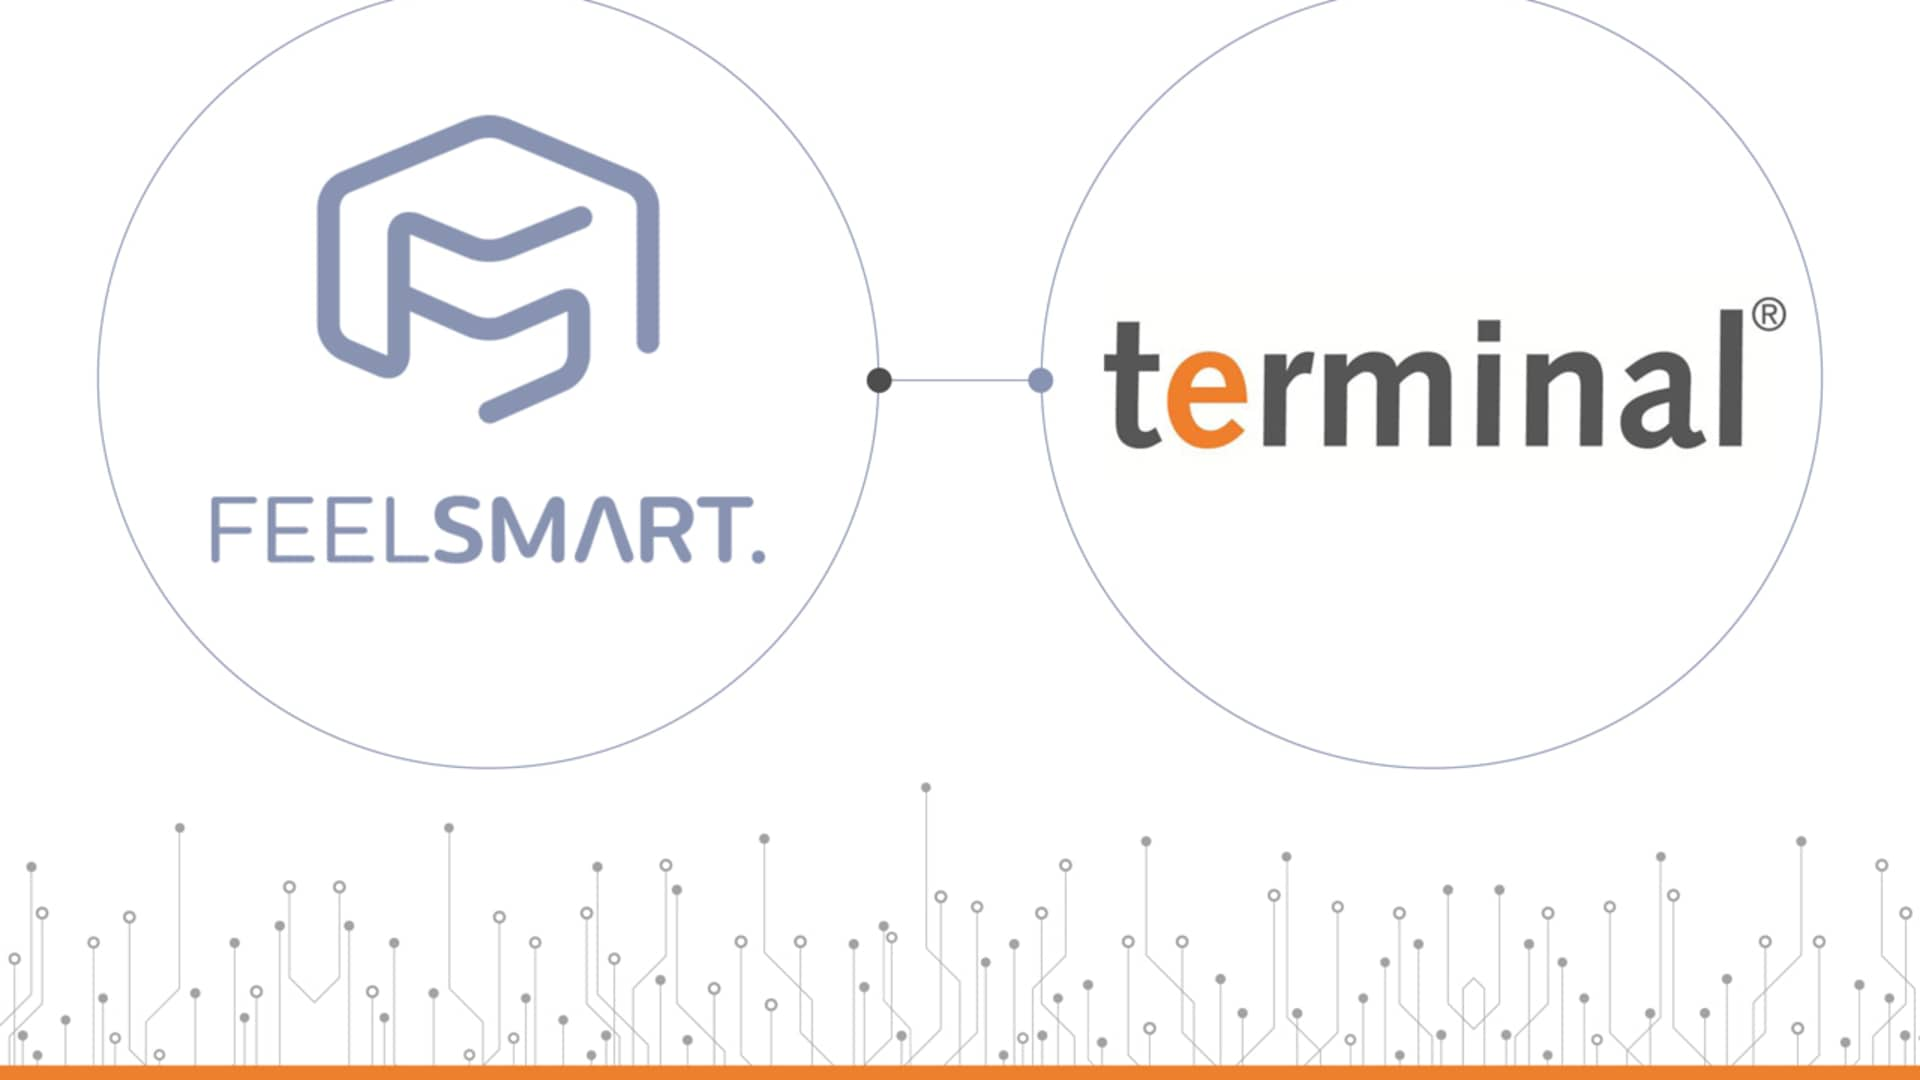 Kooperation terminal und FEELSMART.